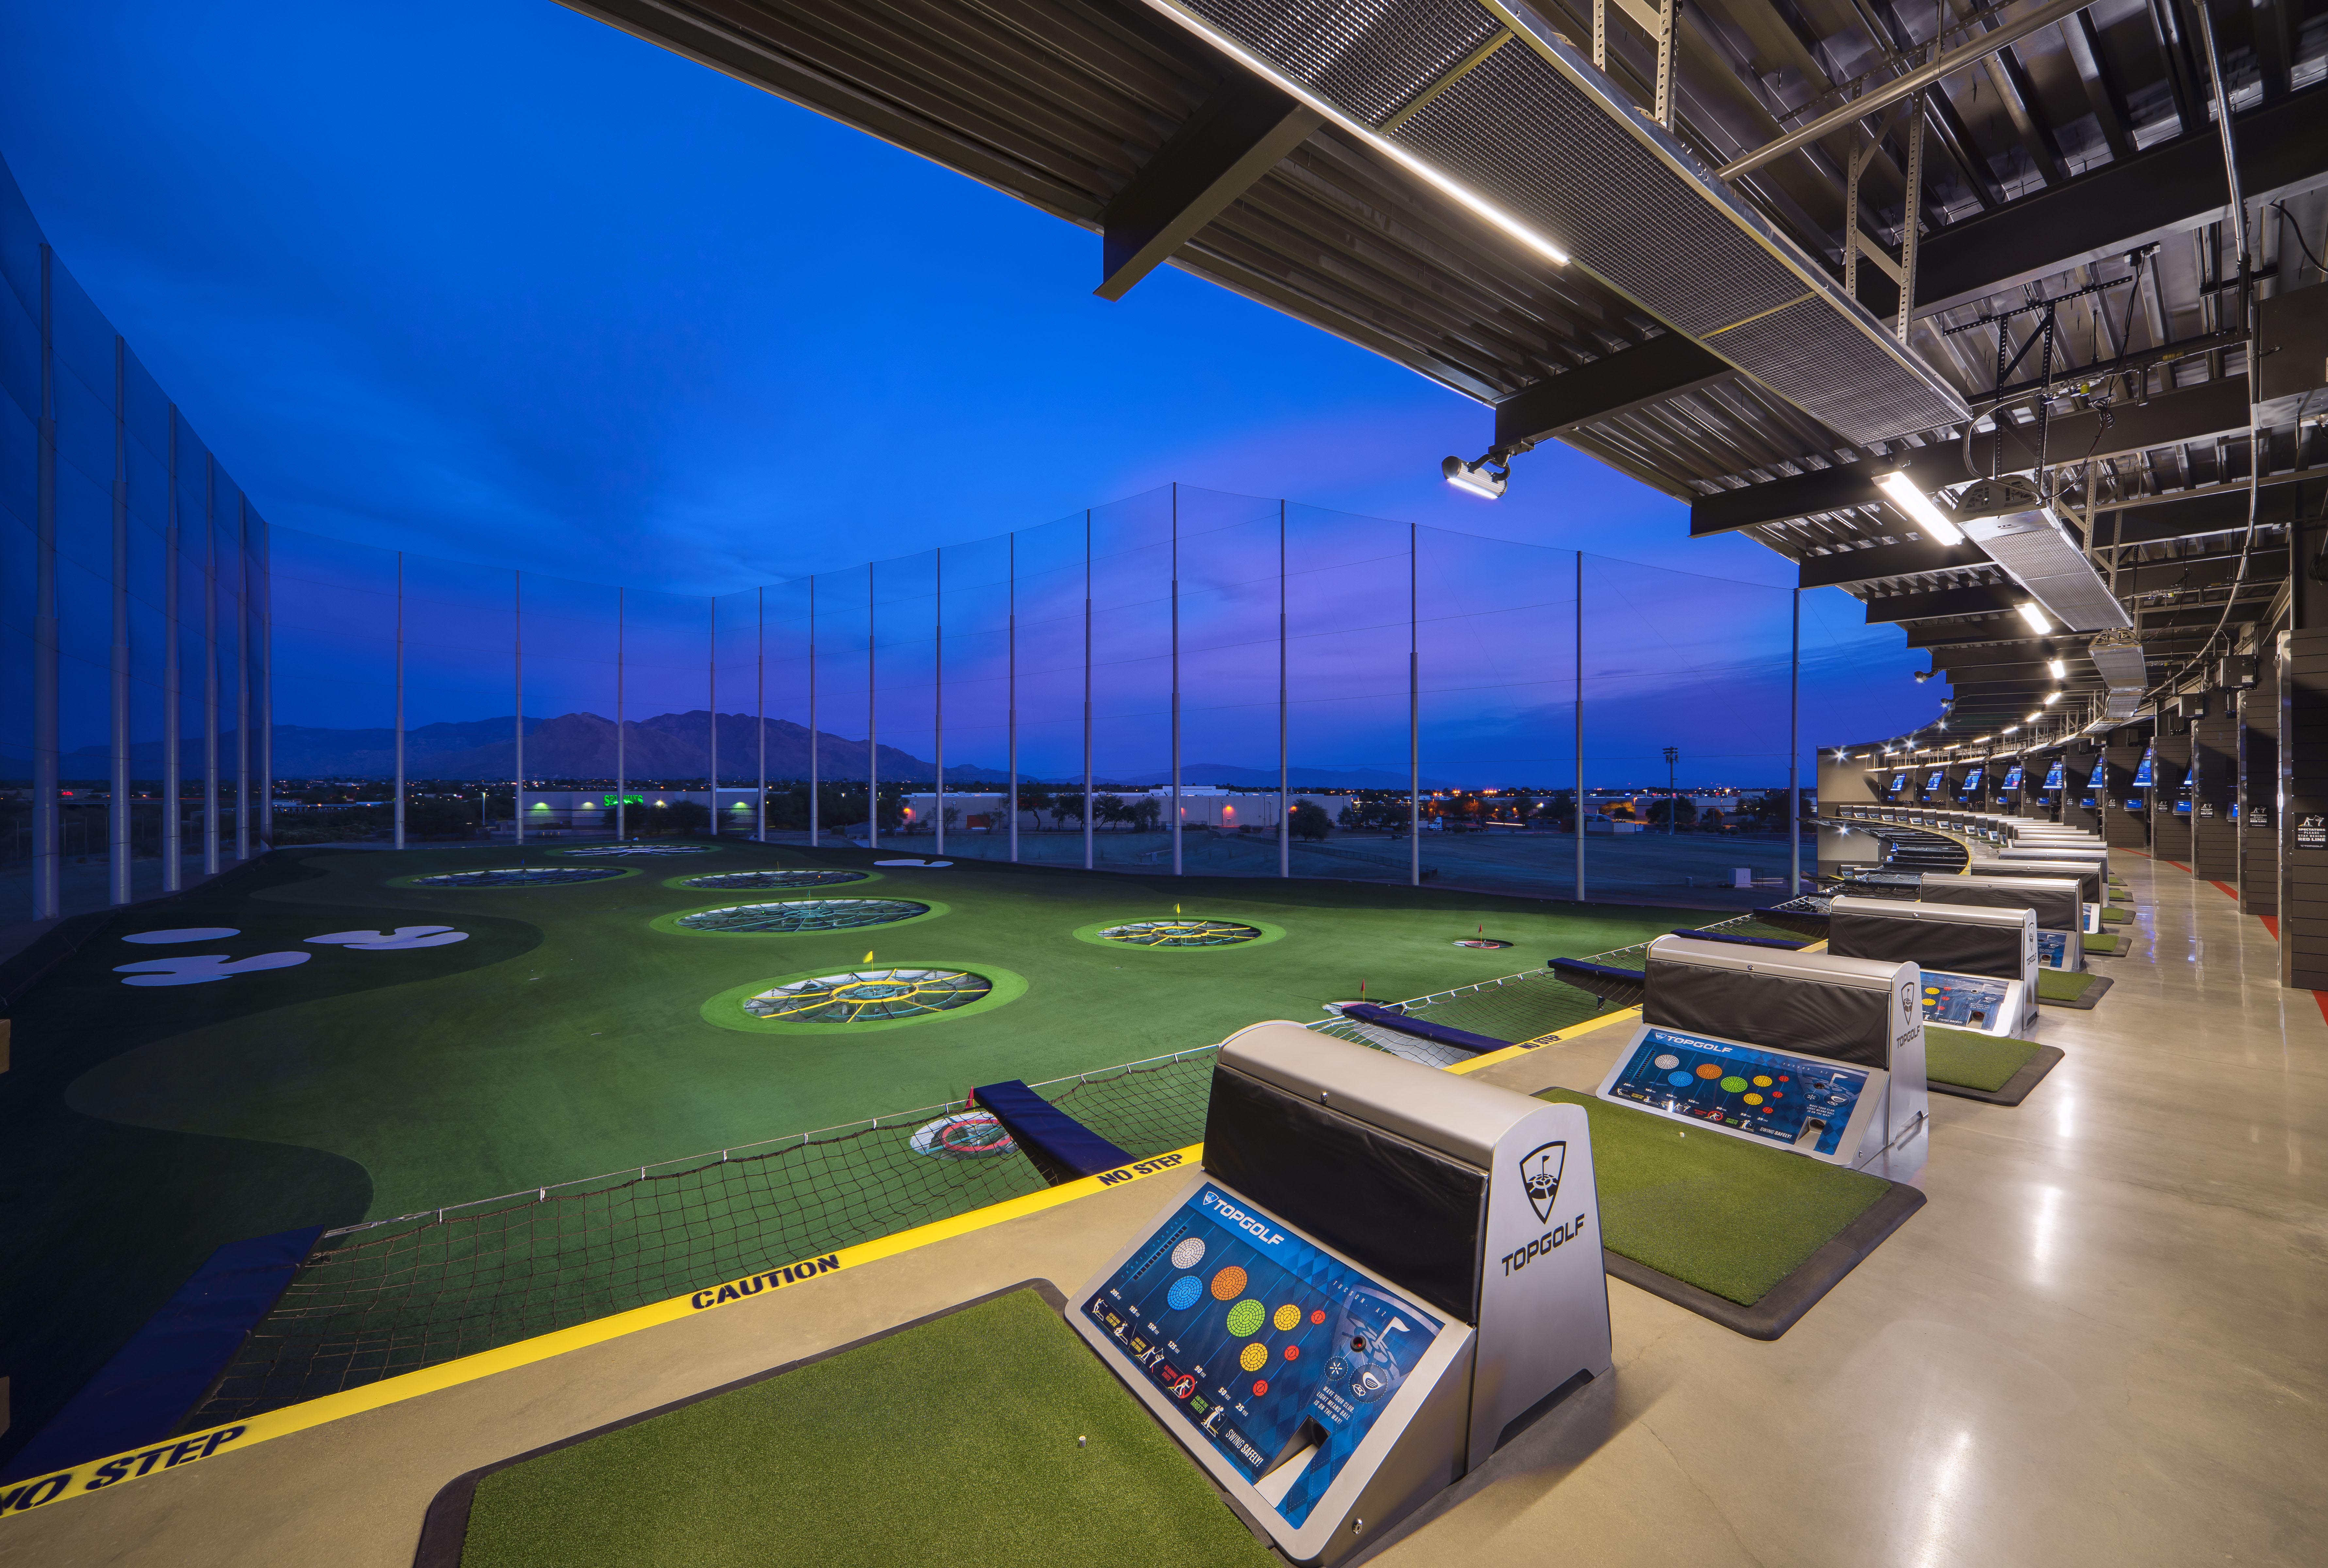 Salt Lake City Golf >> Pressroom | Topgolf - Visuals | Page 1